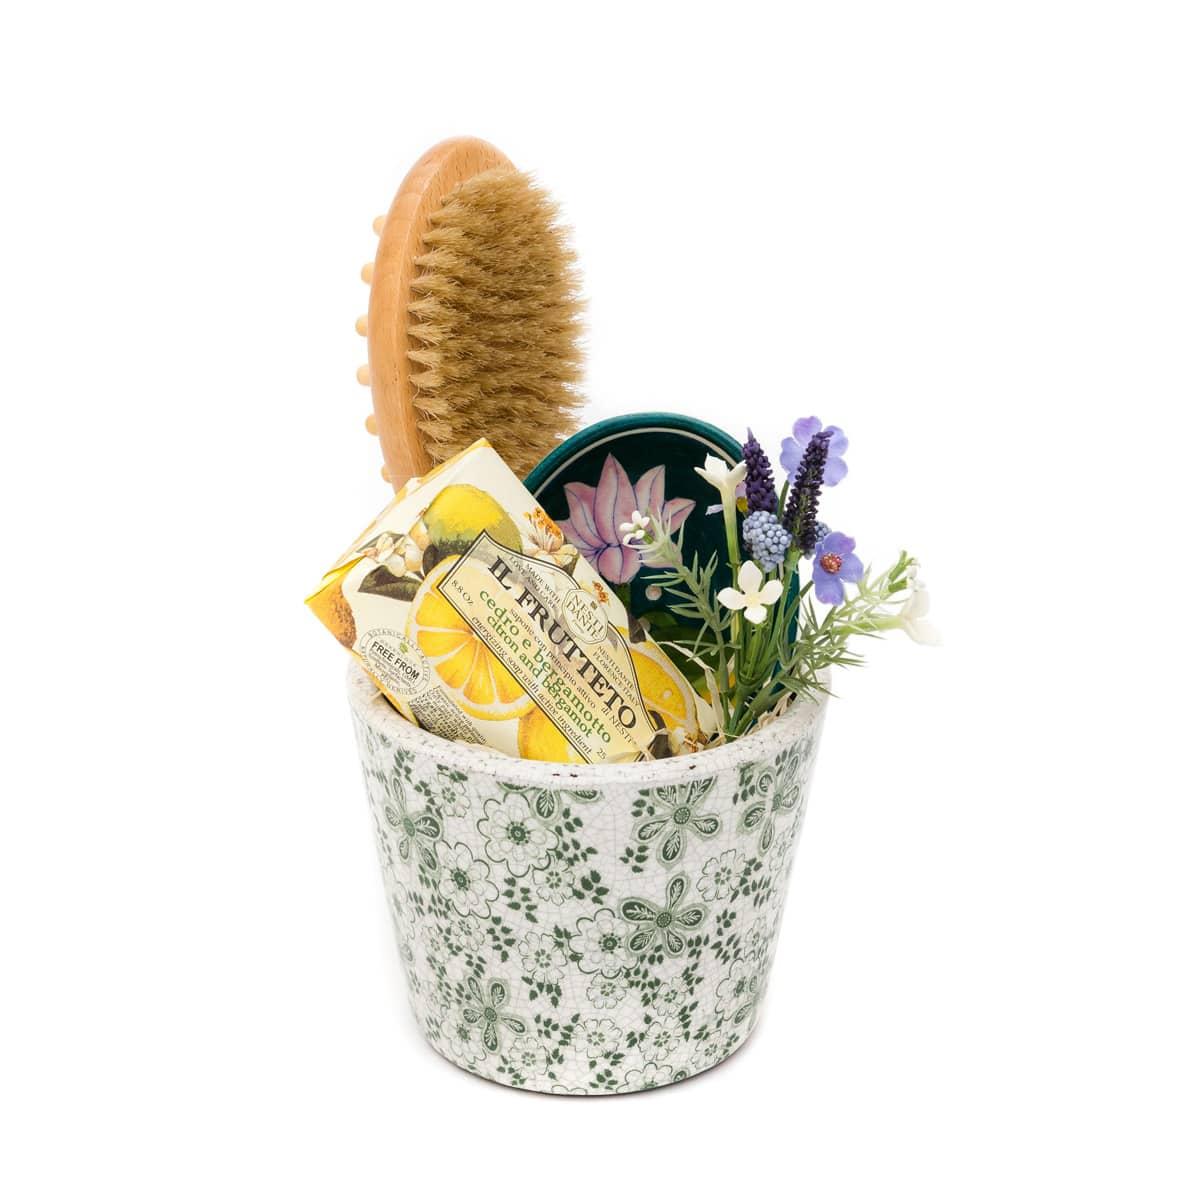 Dutch Pot Gift Set Citron And Bergamont | Restoration Yard